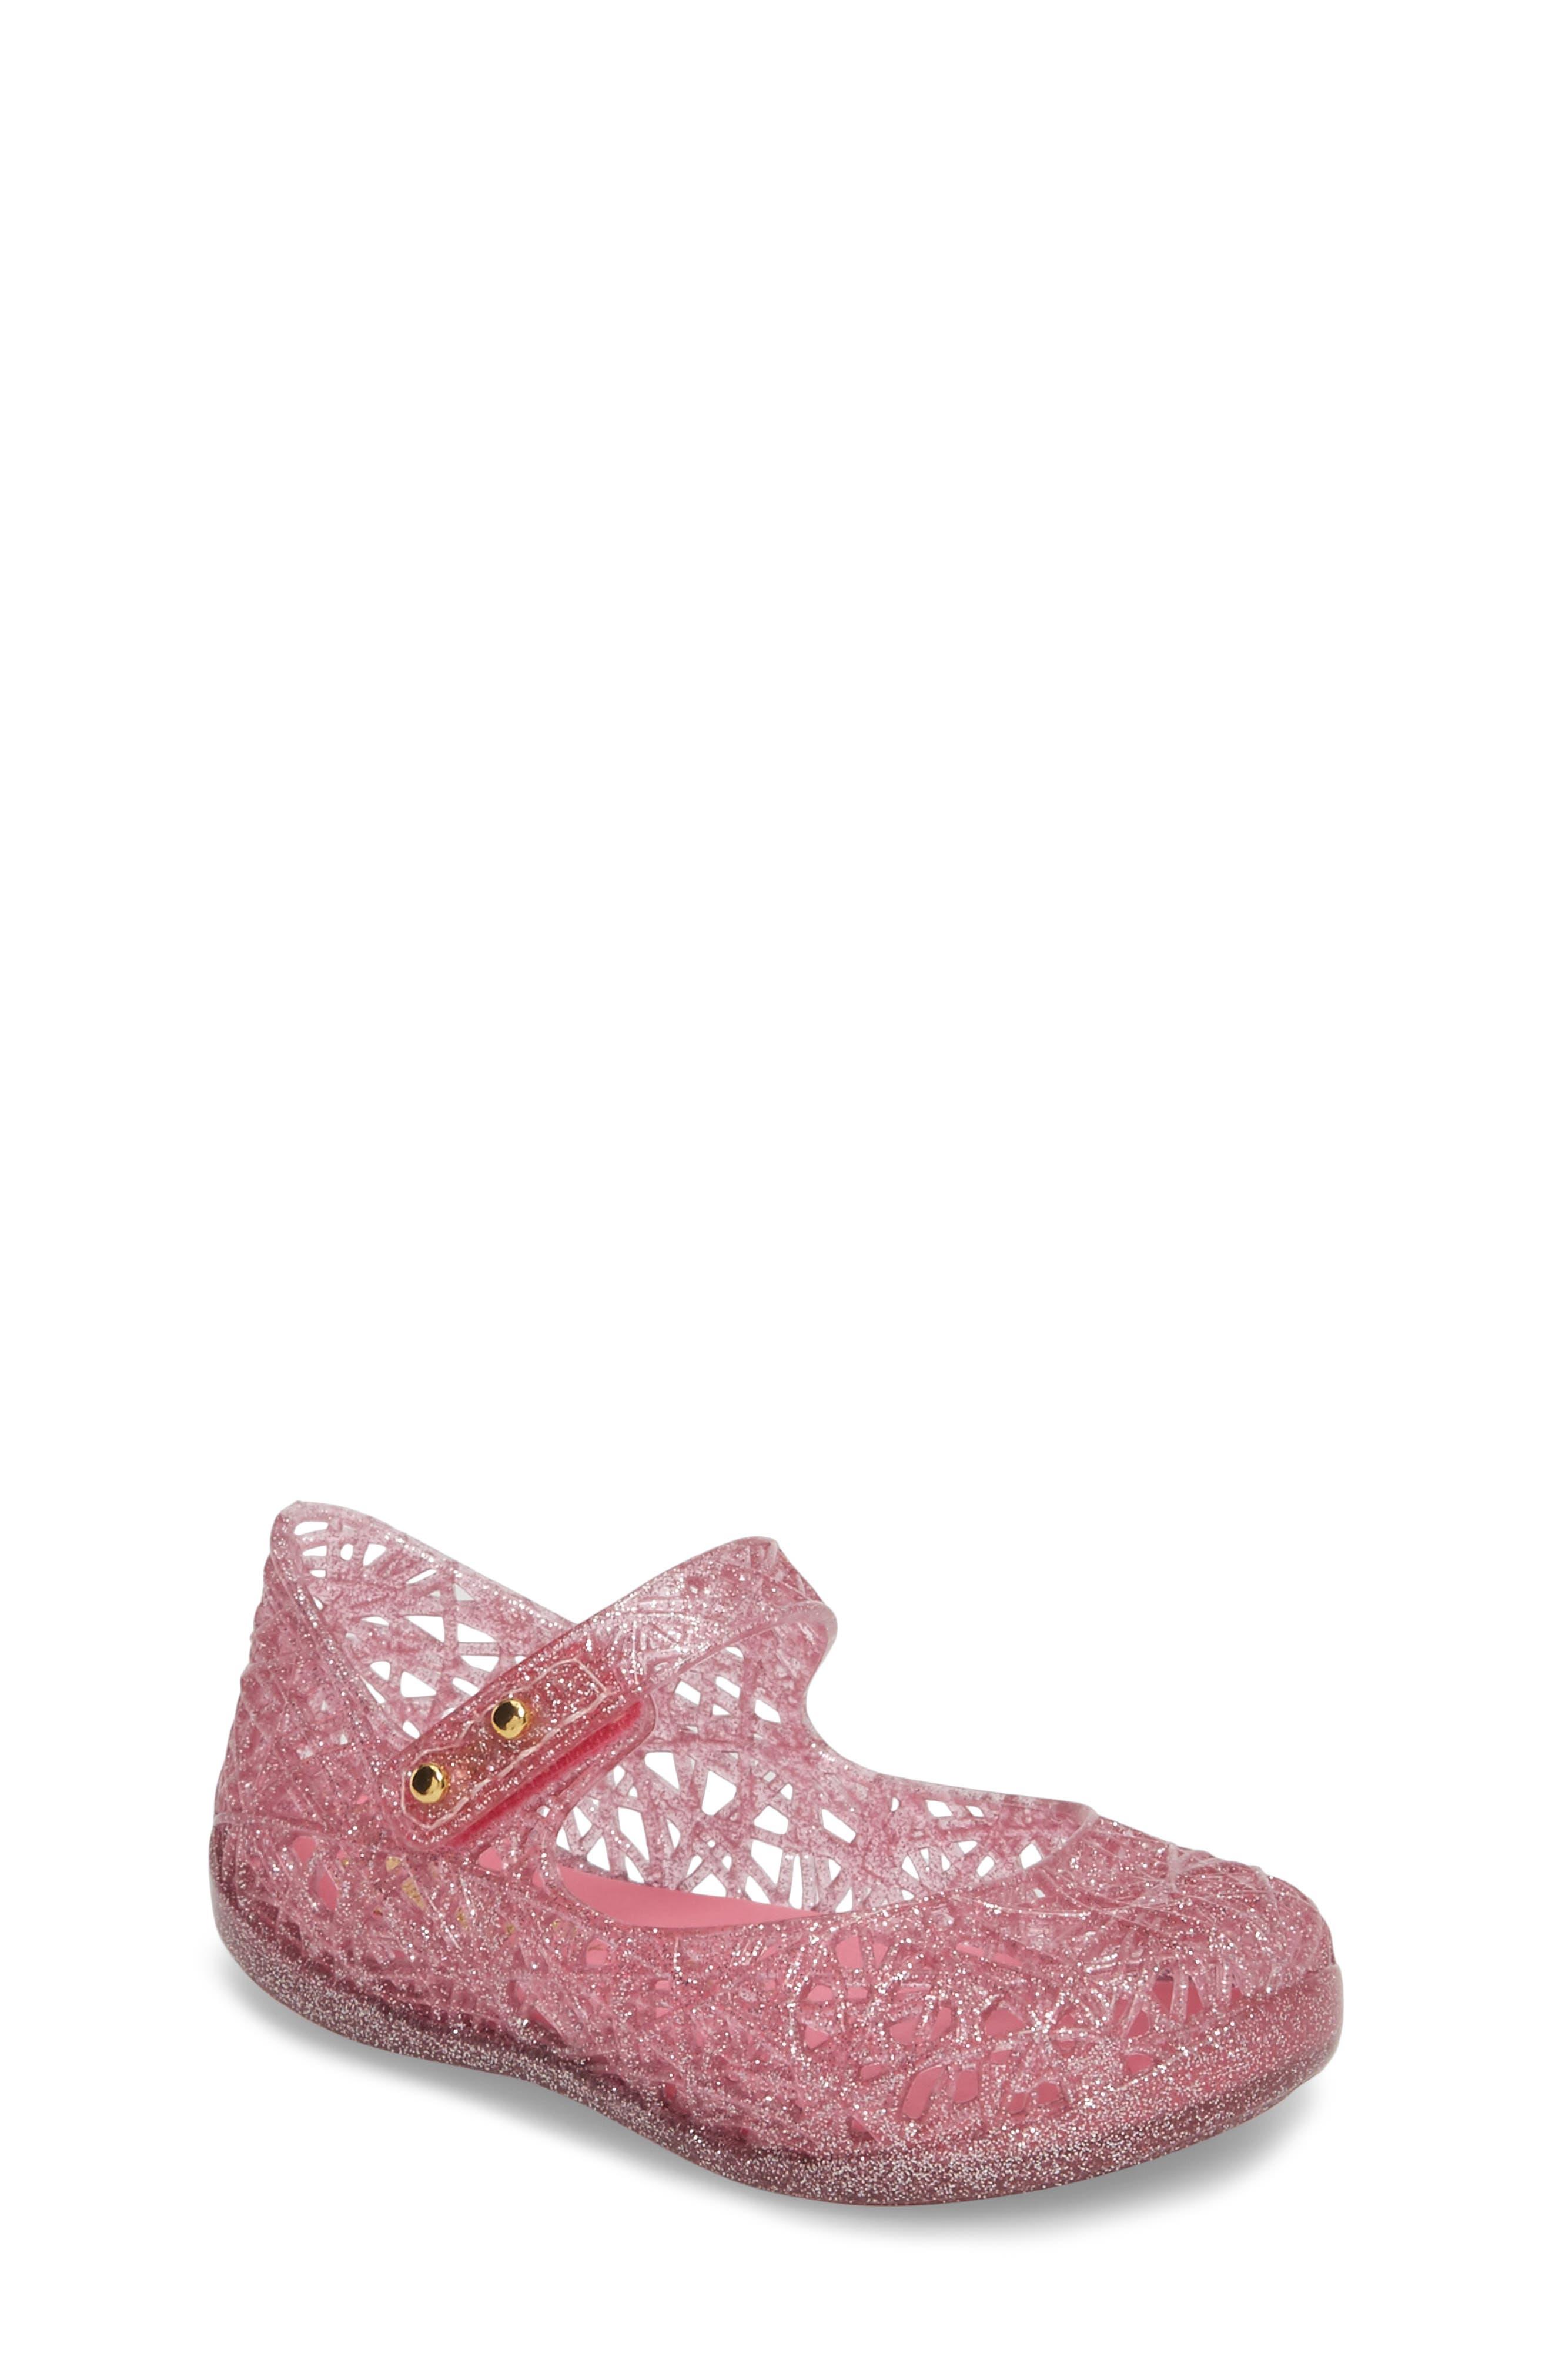 'Campana' Mary Jane Flat,                         Main,                         color, PINK/PINK GLITTER